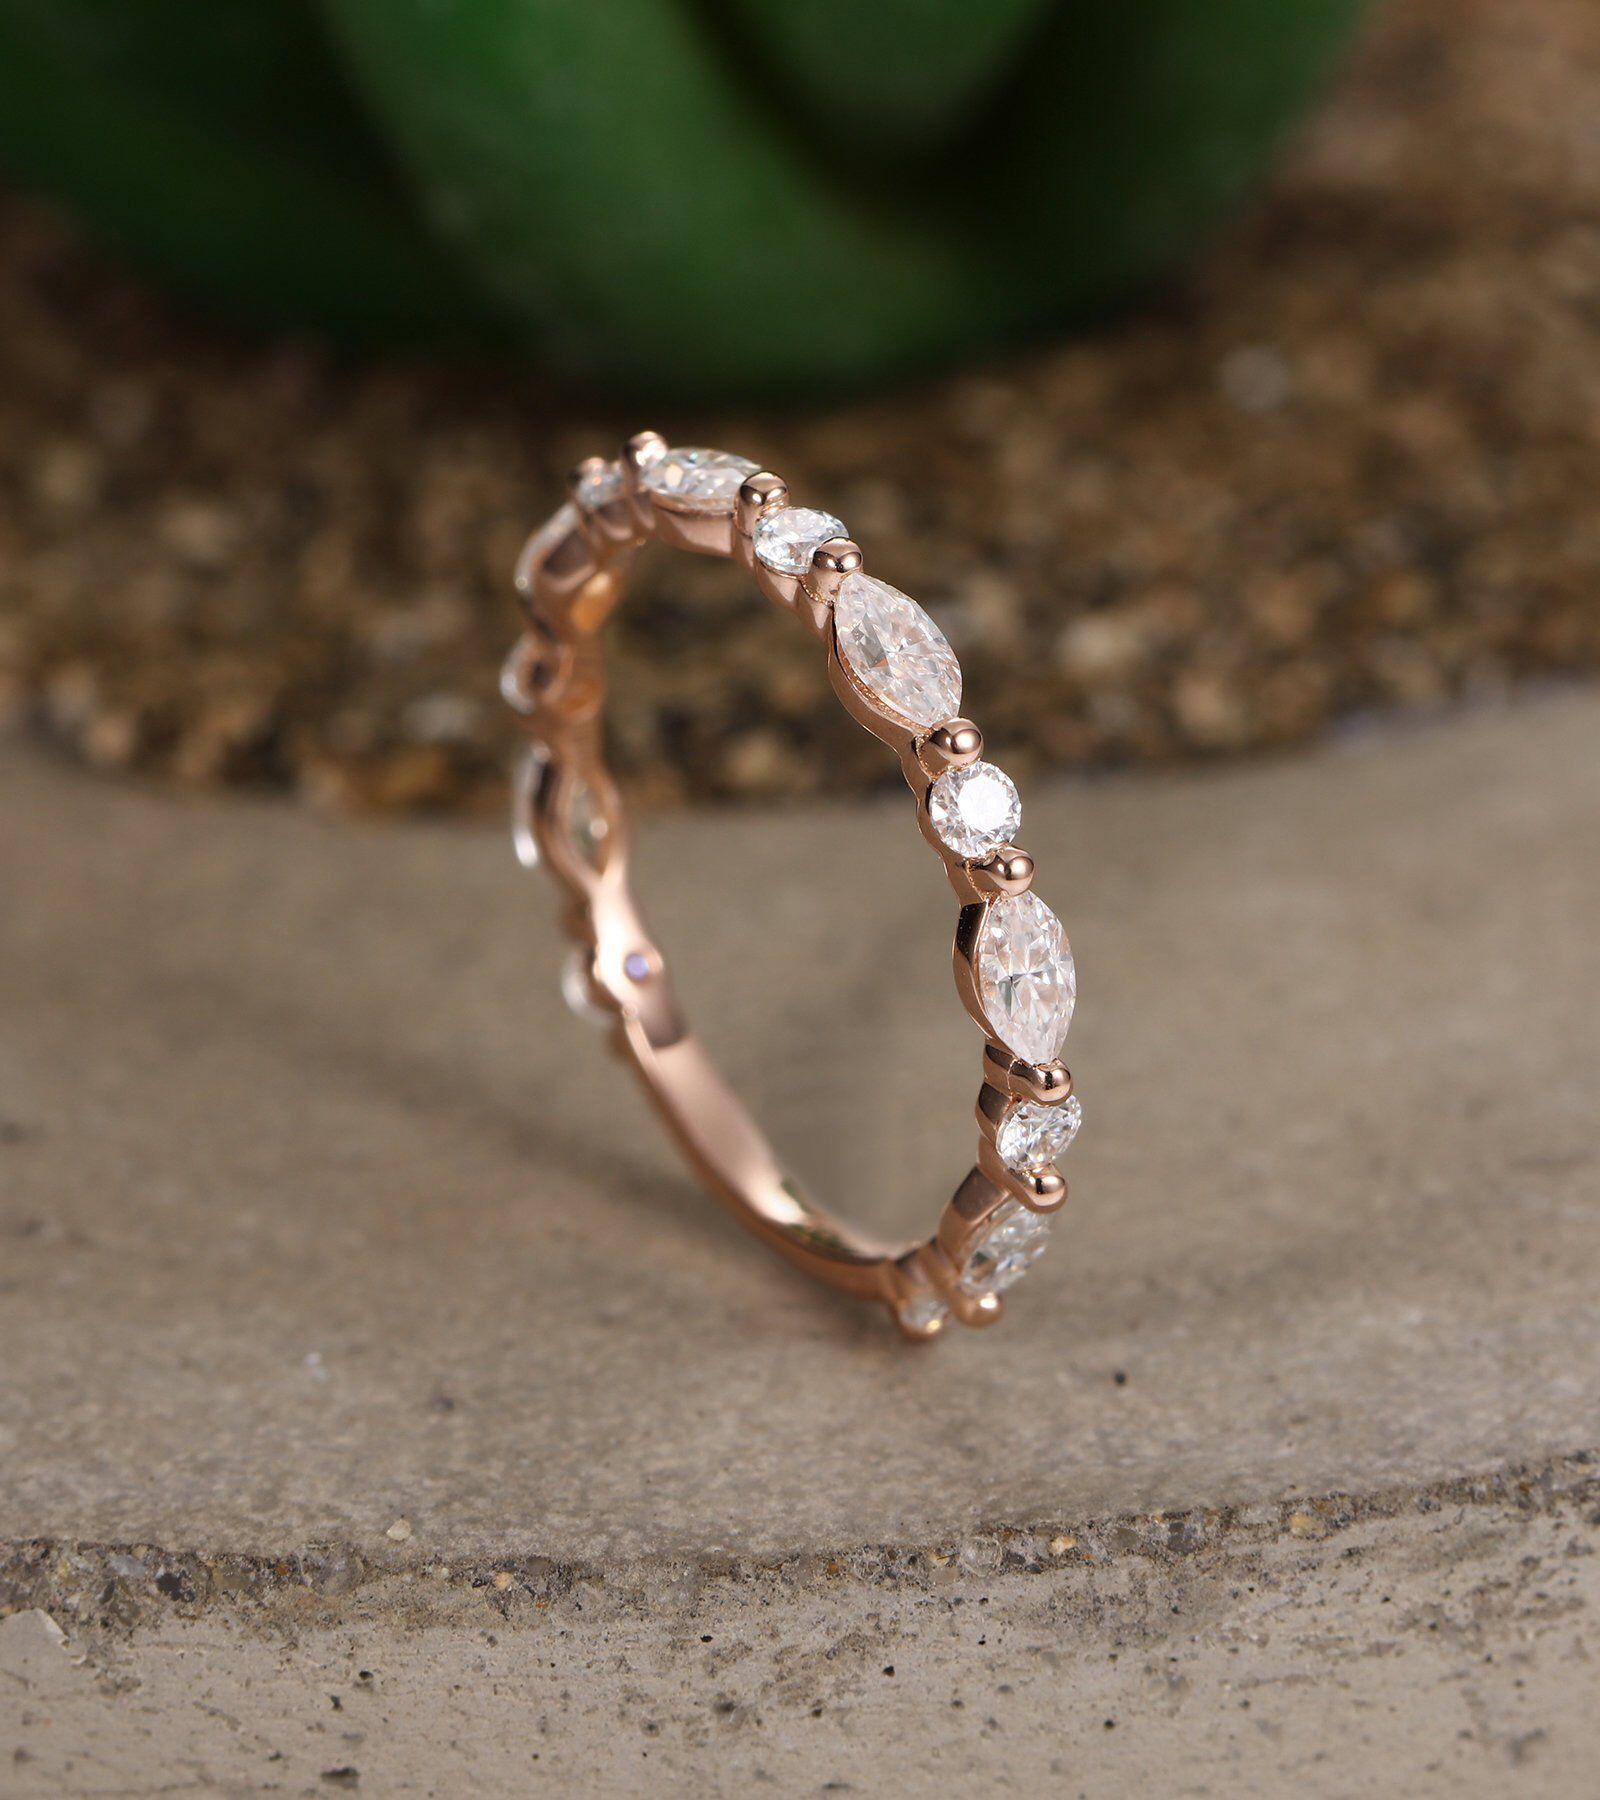 vintage milgrain stacking matching bridal jewelry promise ring anniversary gift for her DiamondMoissanite rose gold wedding band women